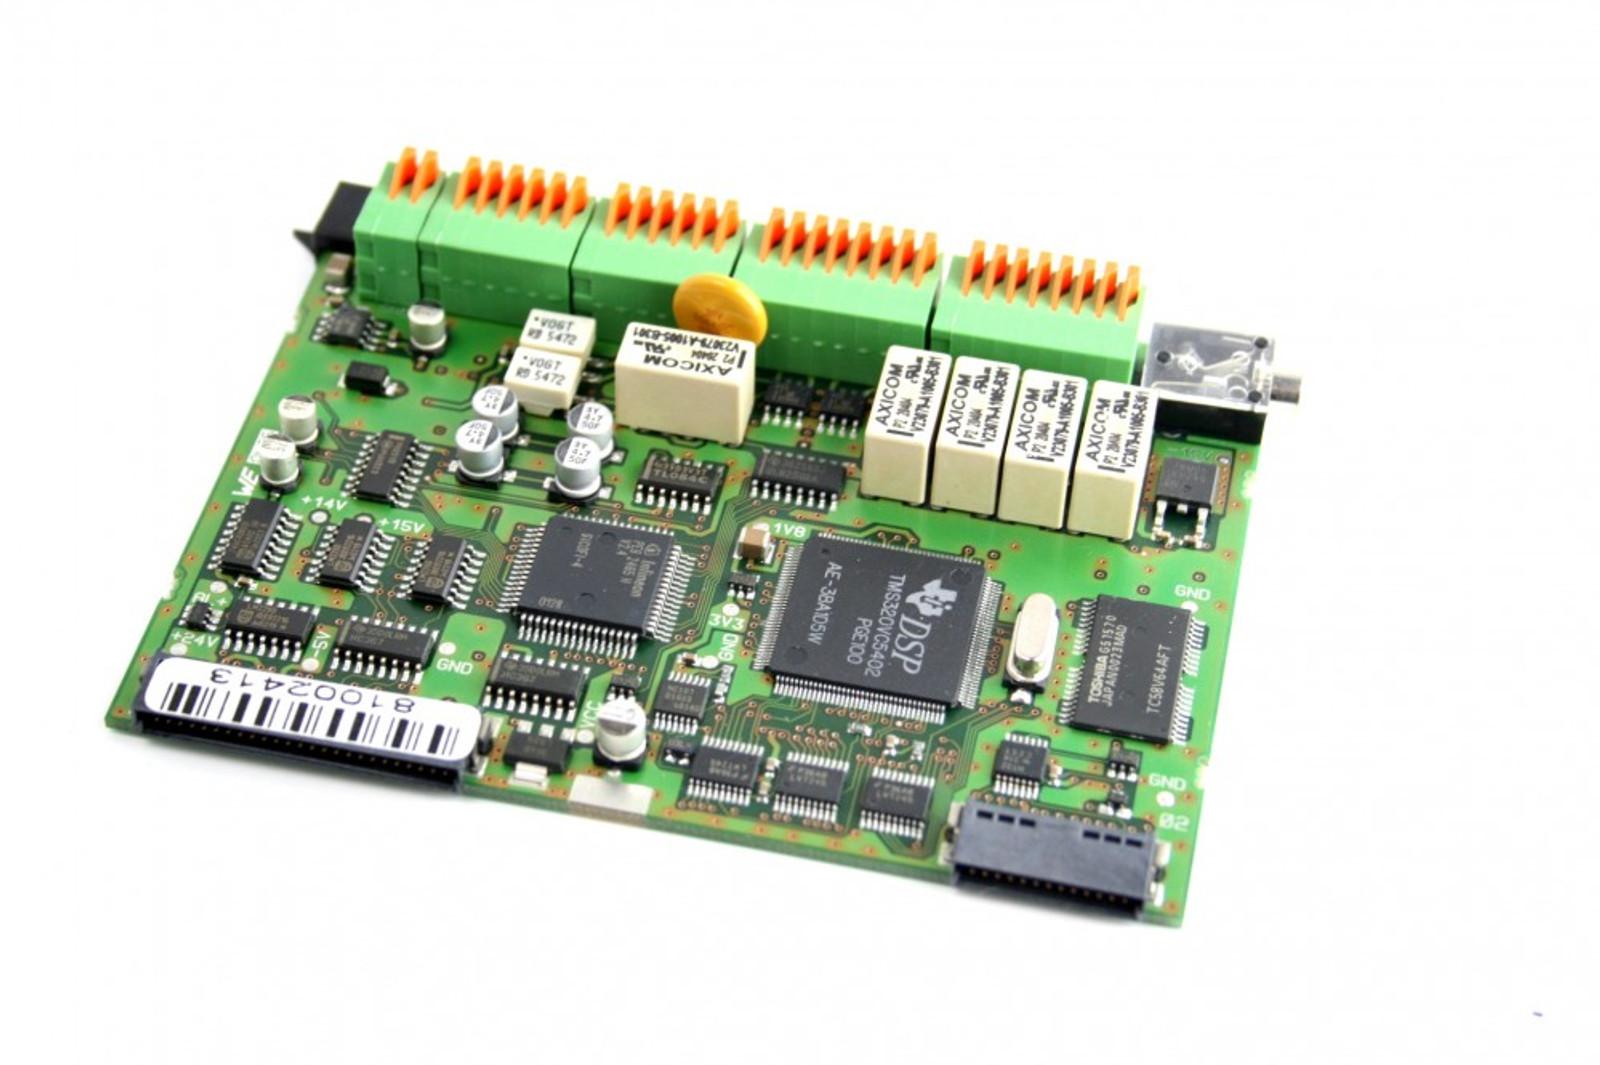 agfeo ais 400 modul rechnung mit mwst telekommunikation agfeo module. Black Bedroom Furniture Sets. Home Design Ideas